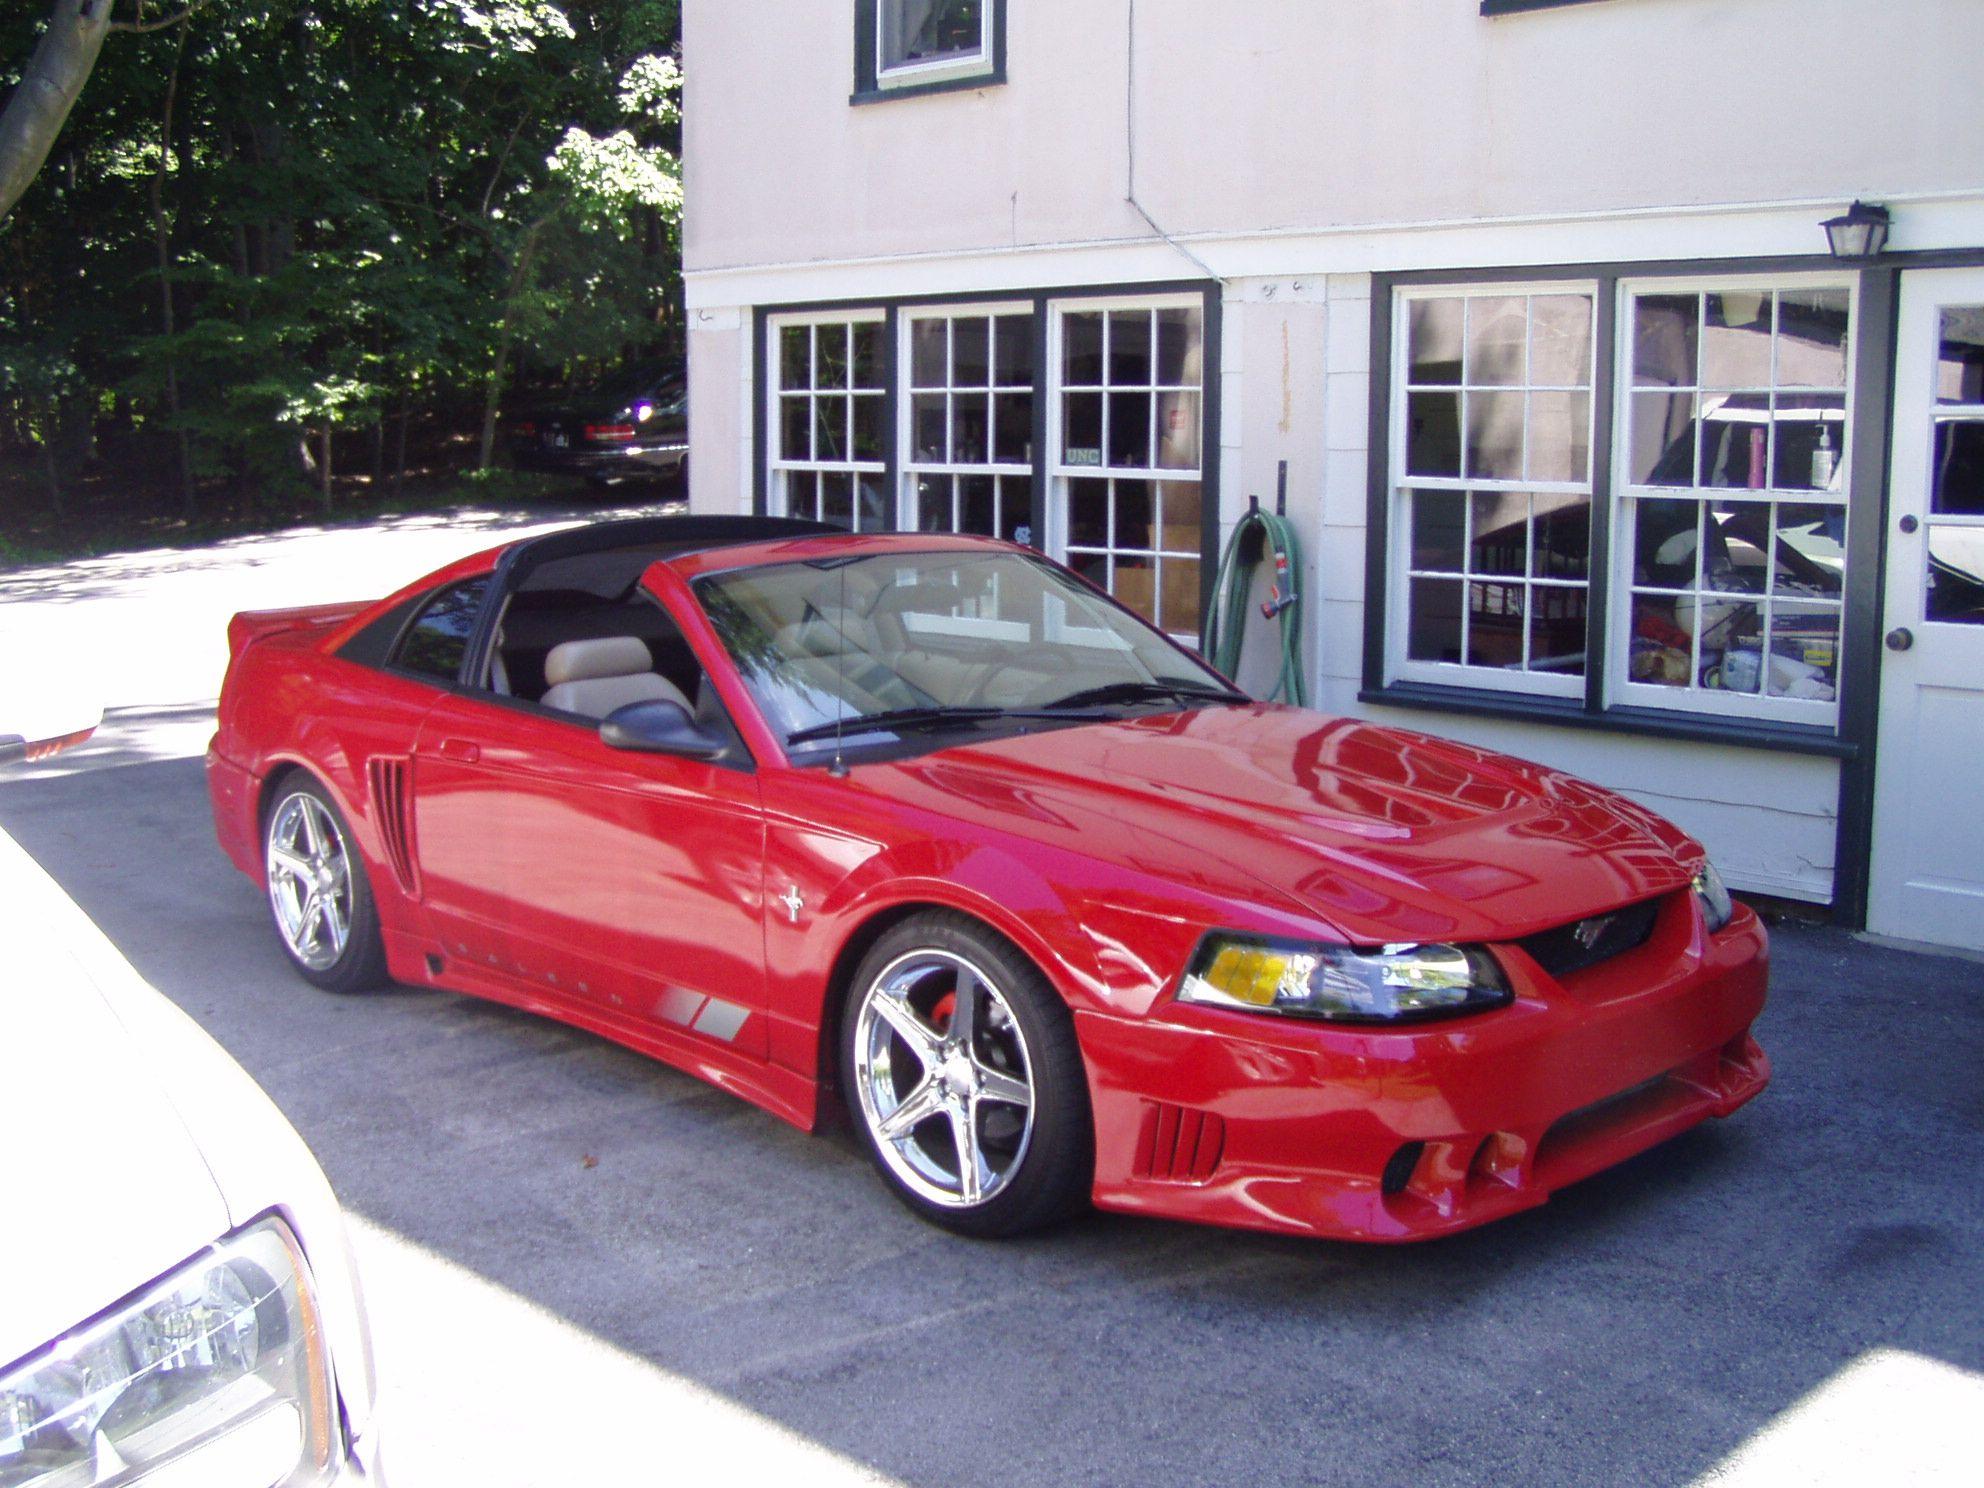 My Old 2000 Mustang Targa Top Conversion